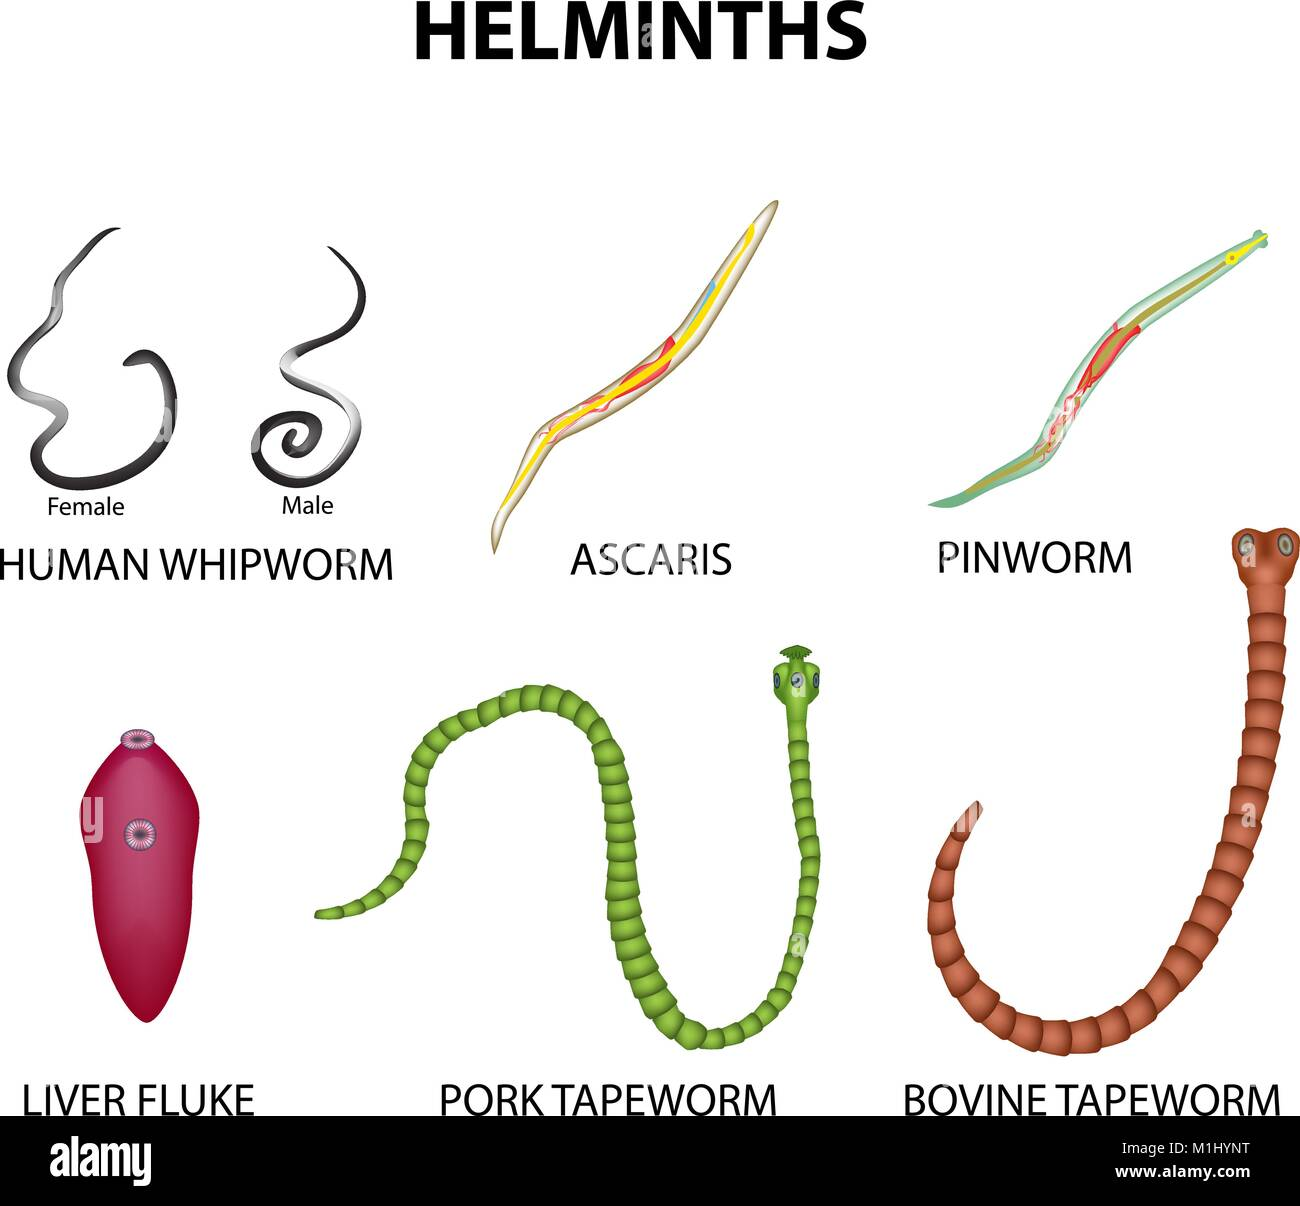 A Set Of Helminths Roundworm Ascaris Pinworms Bovine Tapeworm